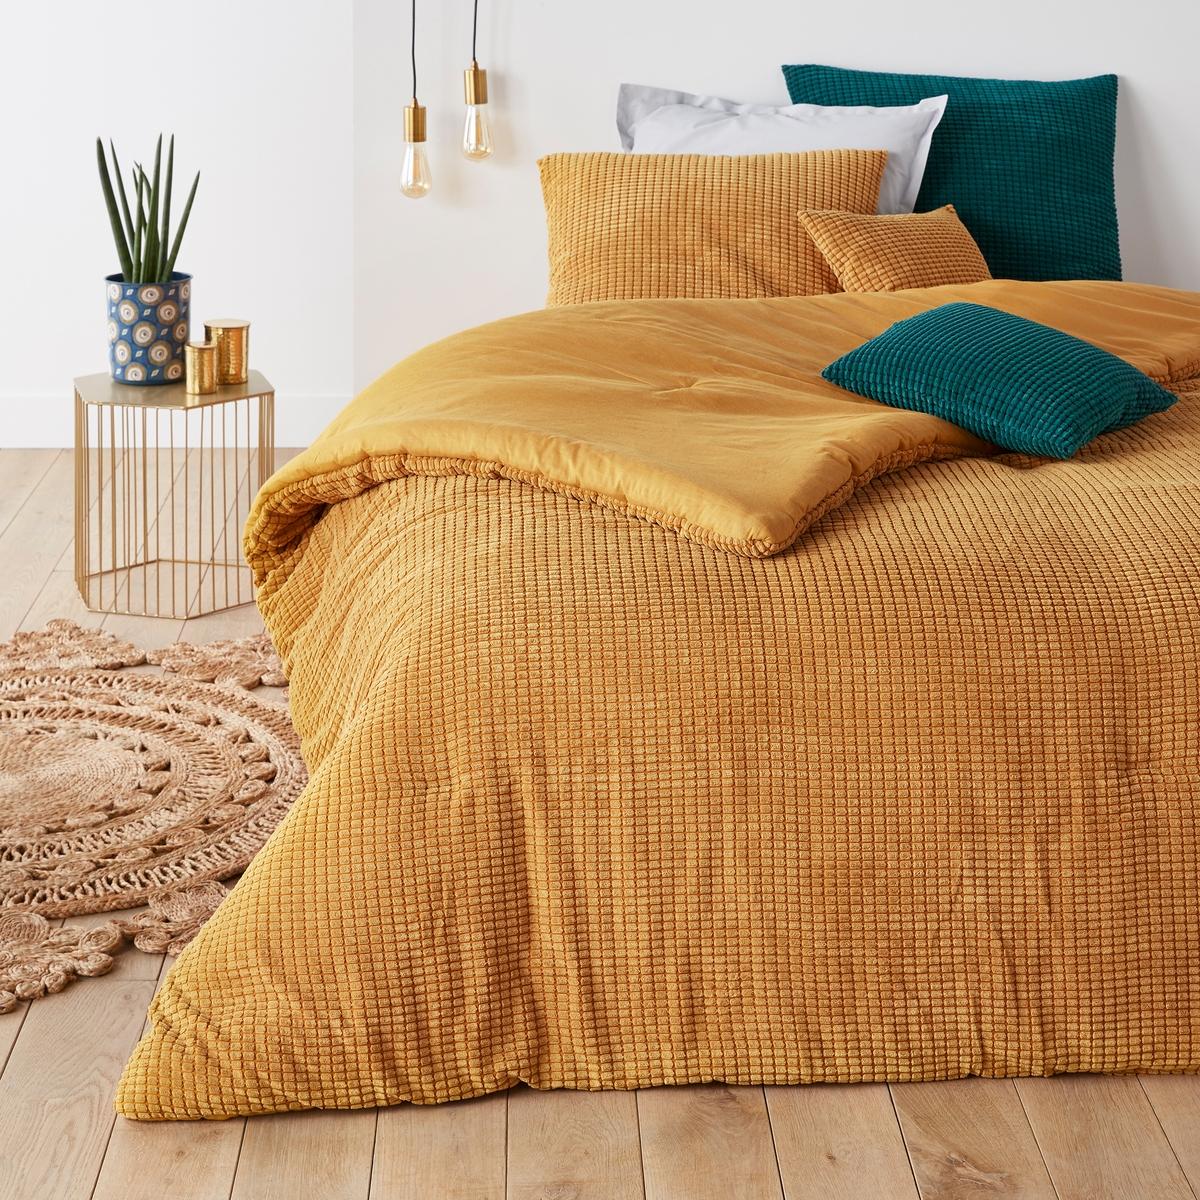 Покрывало La Redoute Рельефное FLUFFY 230 x 250 см желтый